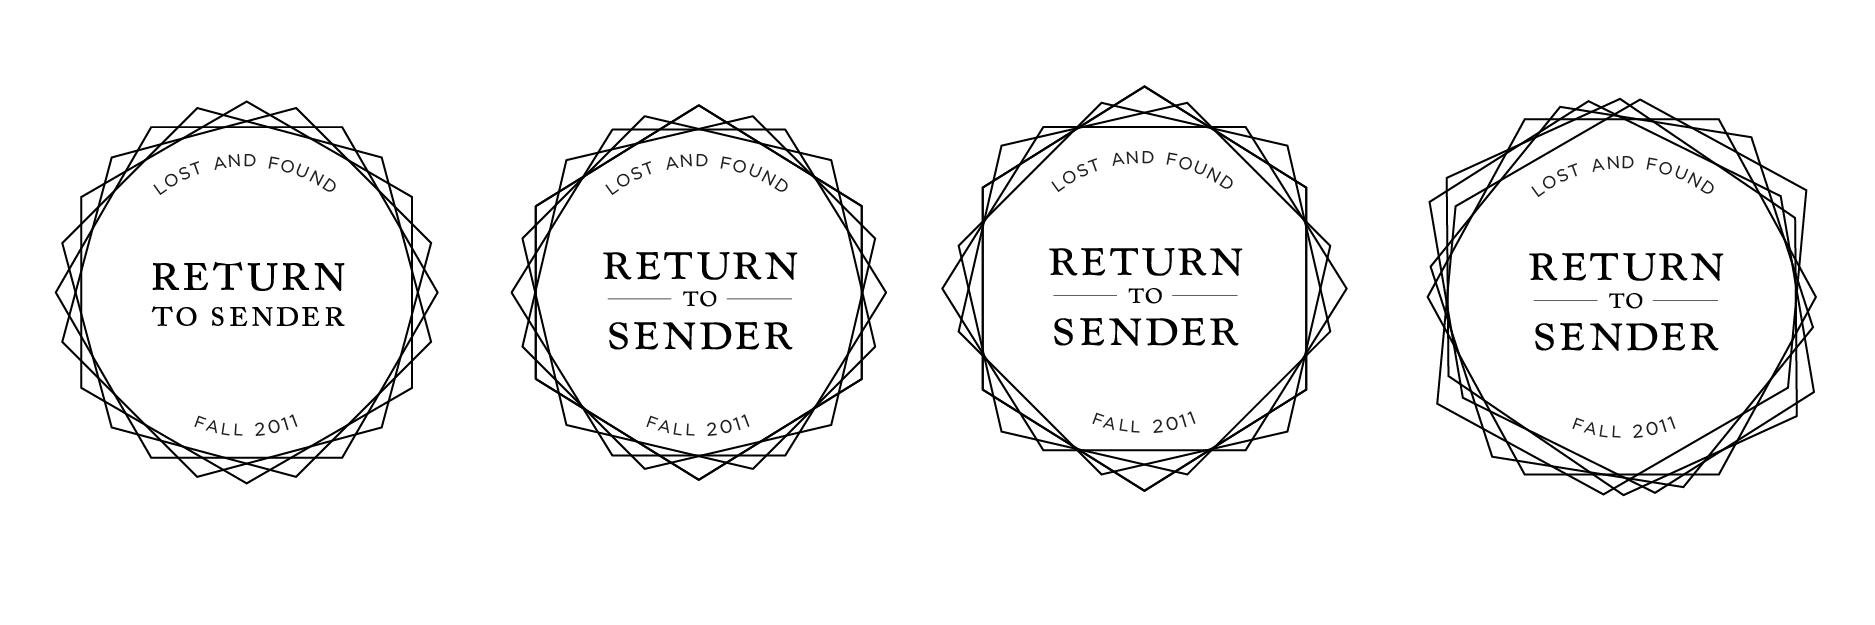 beckwith_returntosender_logo01